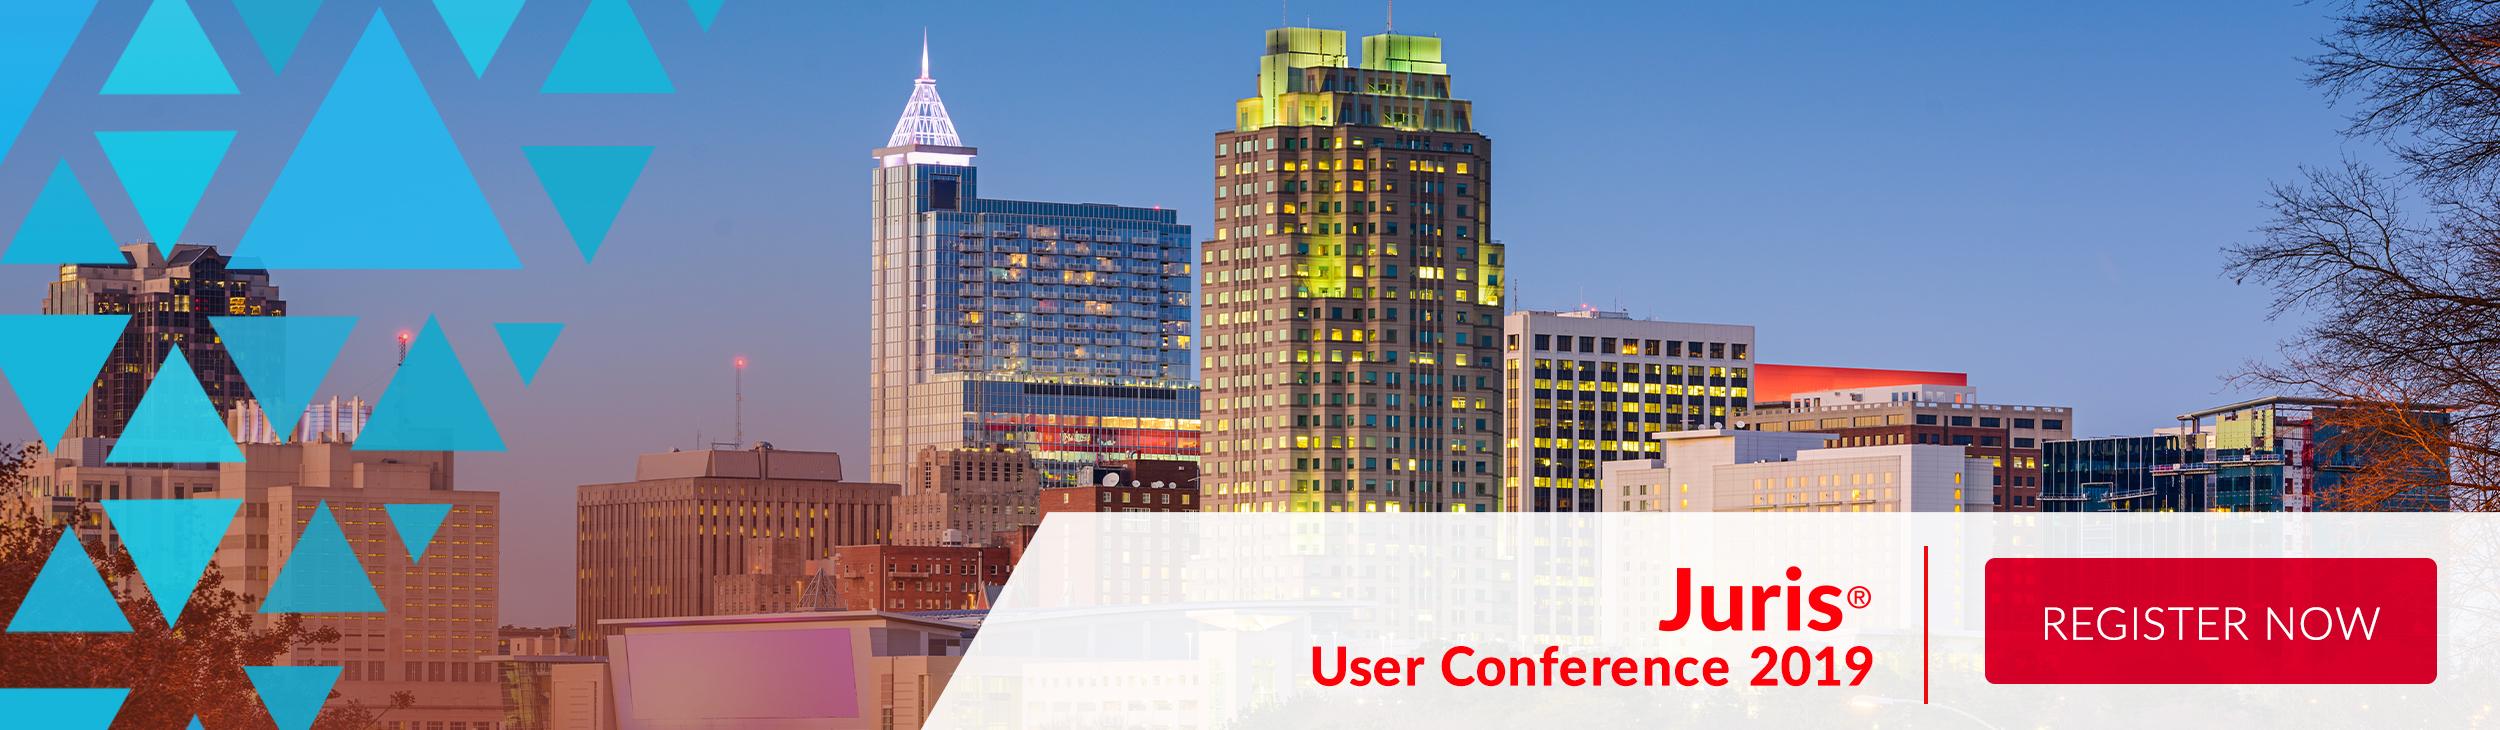 001452 Juris User Conference 2019 Website header 2500x730